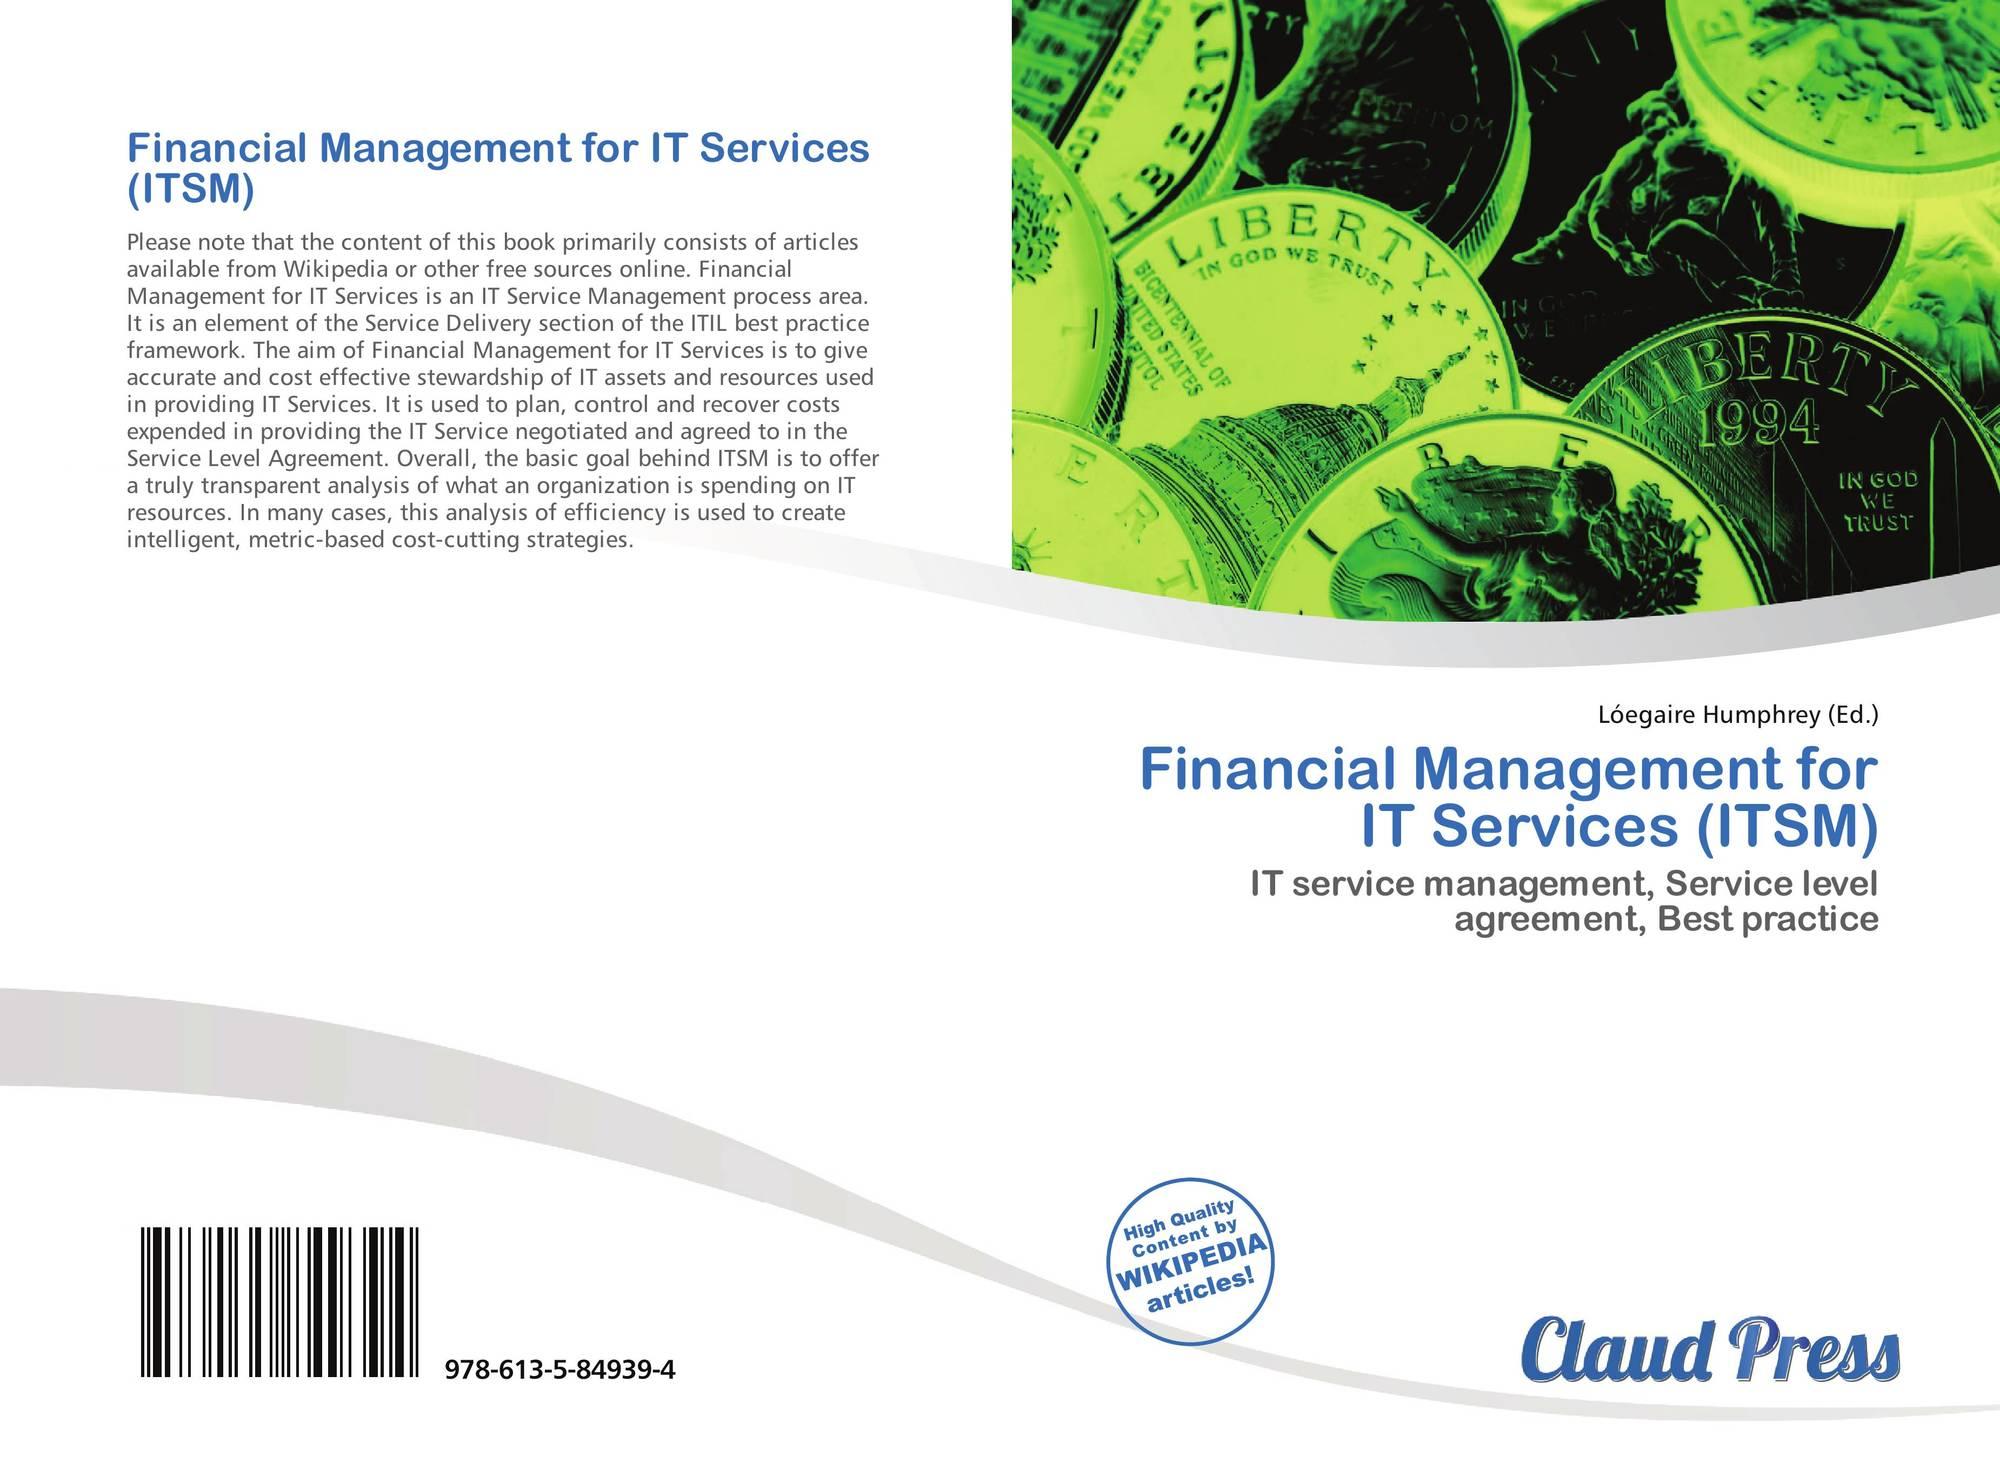 Financial Management For It Services Itsm 978 613 5 84939 4